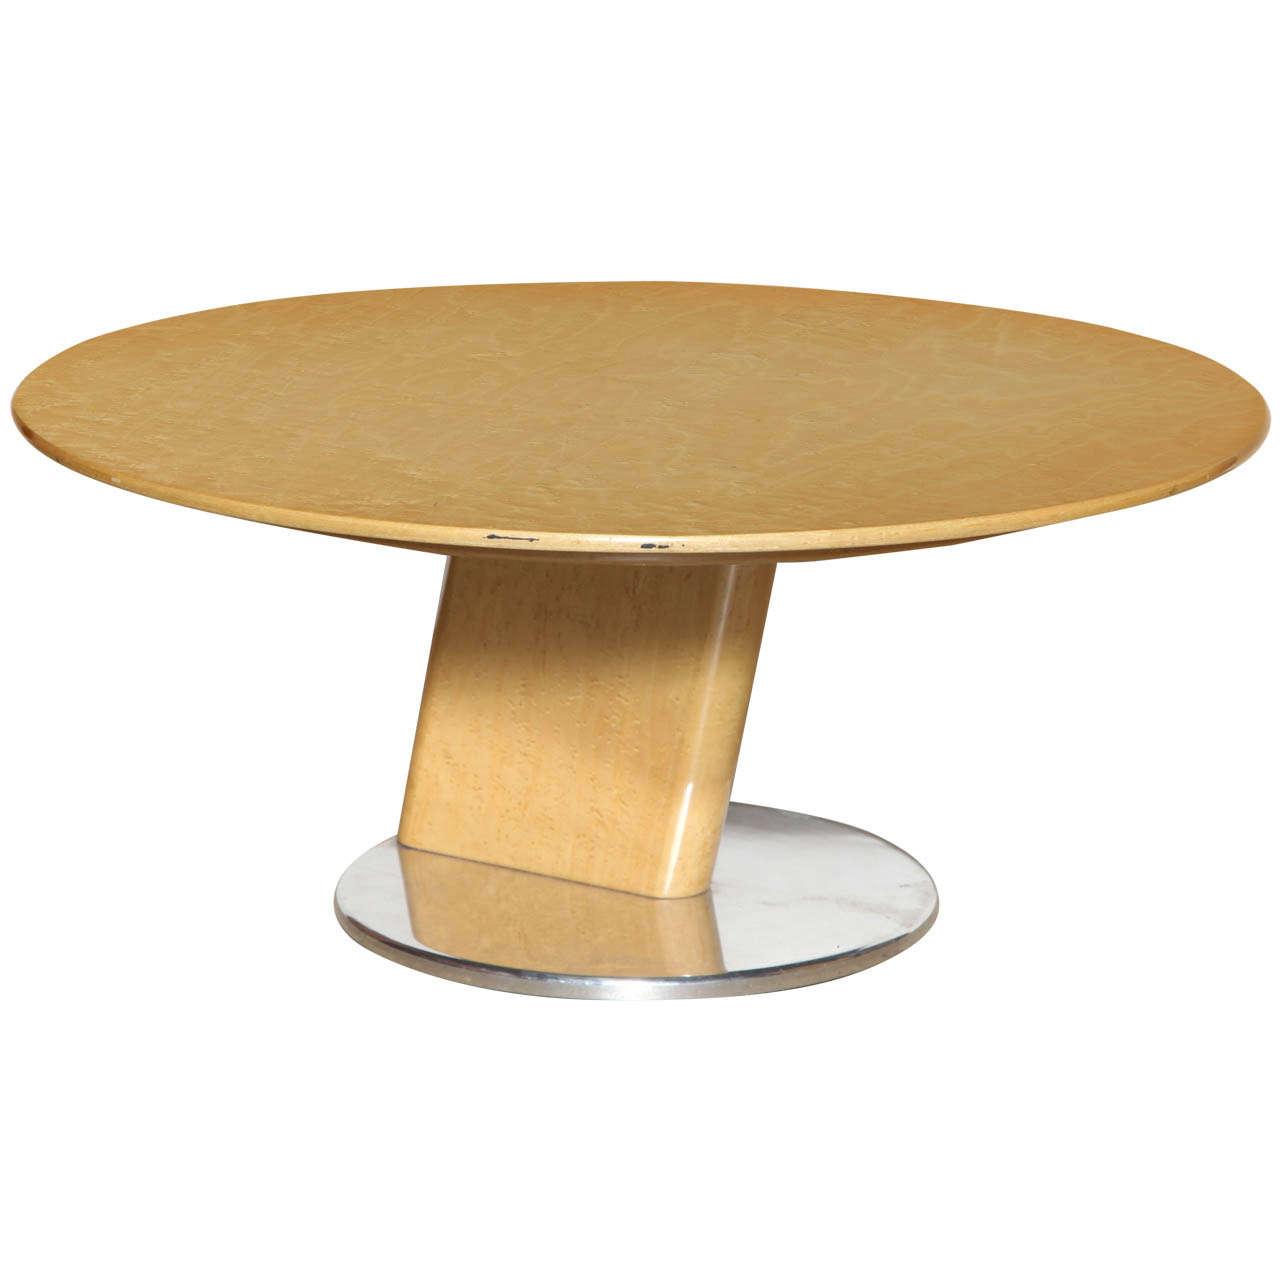 Saporiti Italia Birds Eye Maple and Cast Aluminum Low Table For